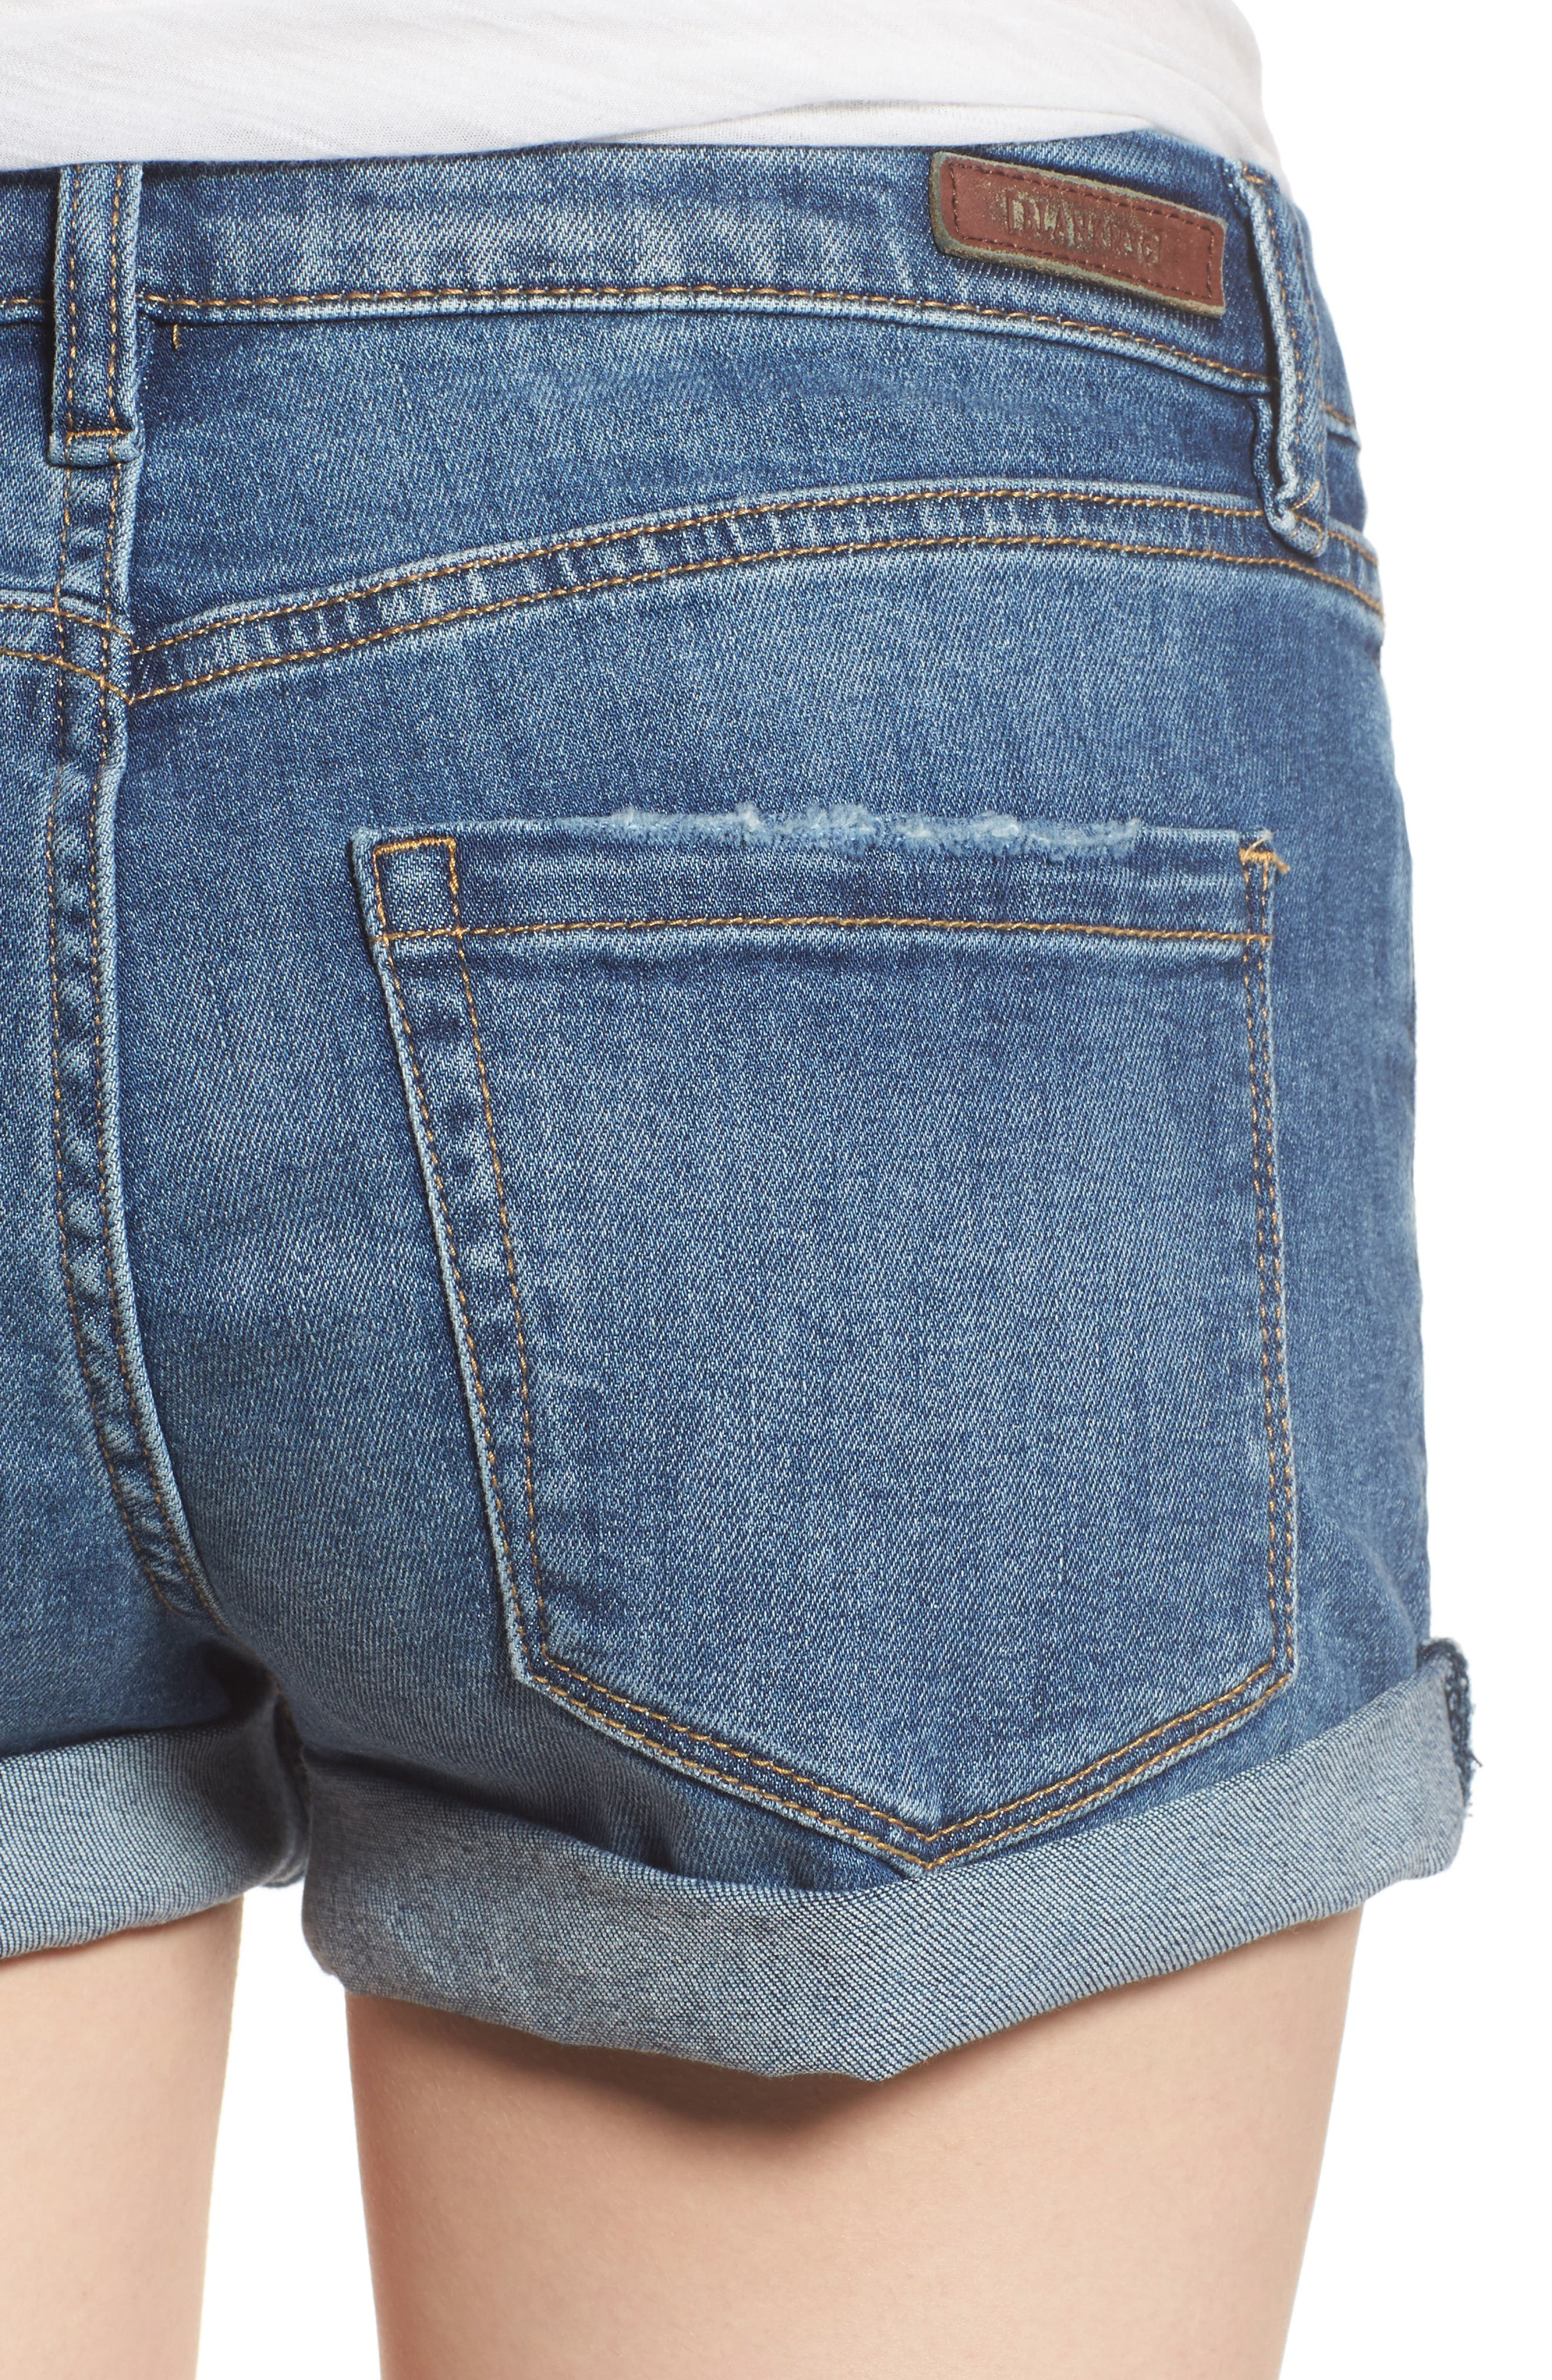 Plalay Hard Cuffed Jean Shorts,                             Alternate thumbnail 4, color,                             Blue